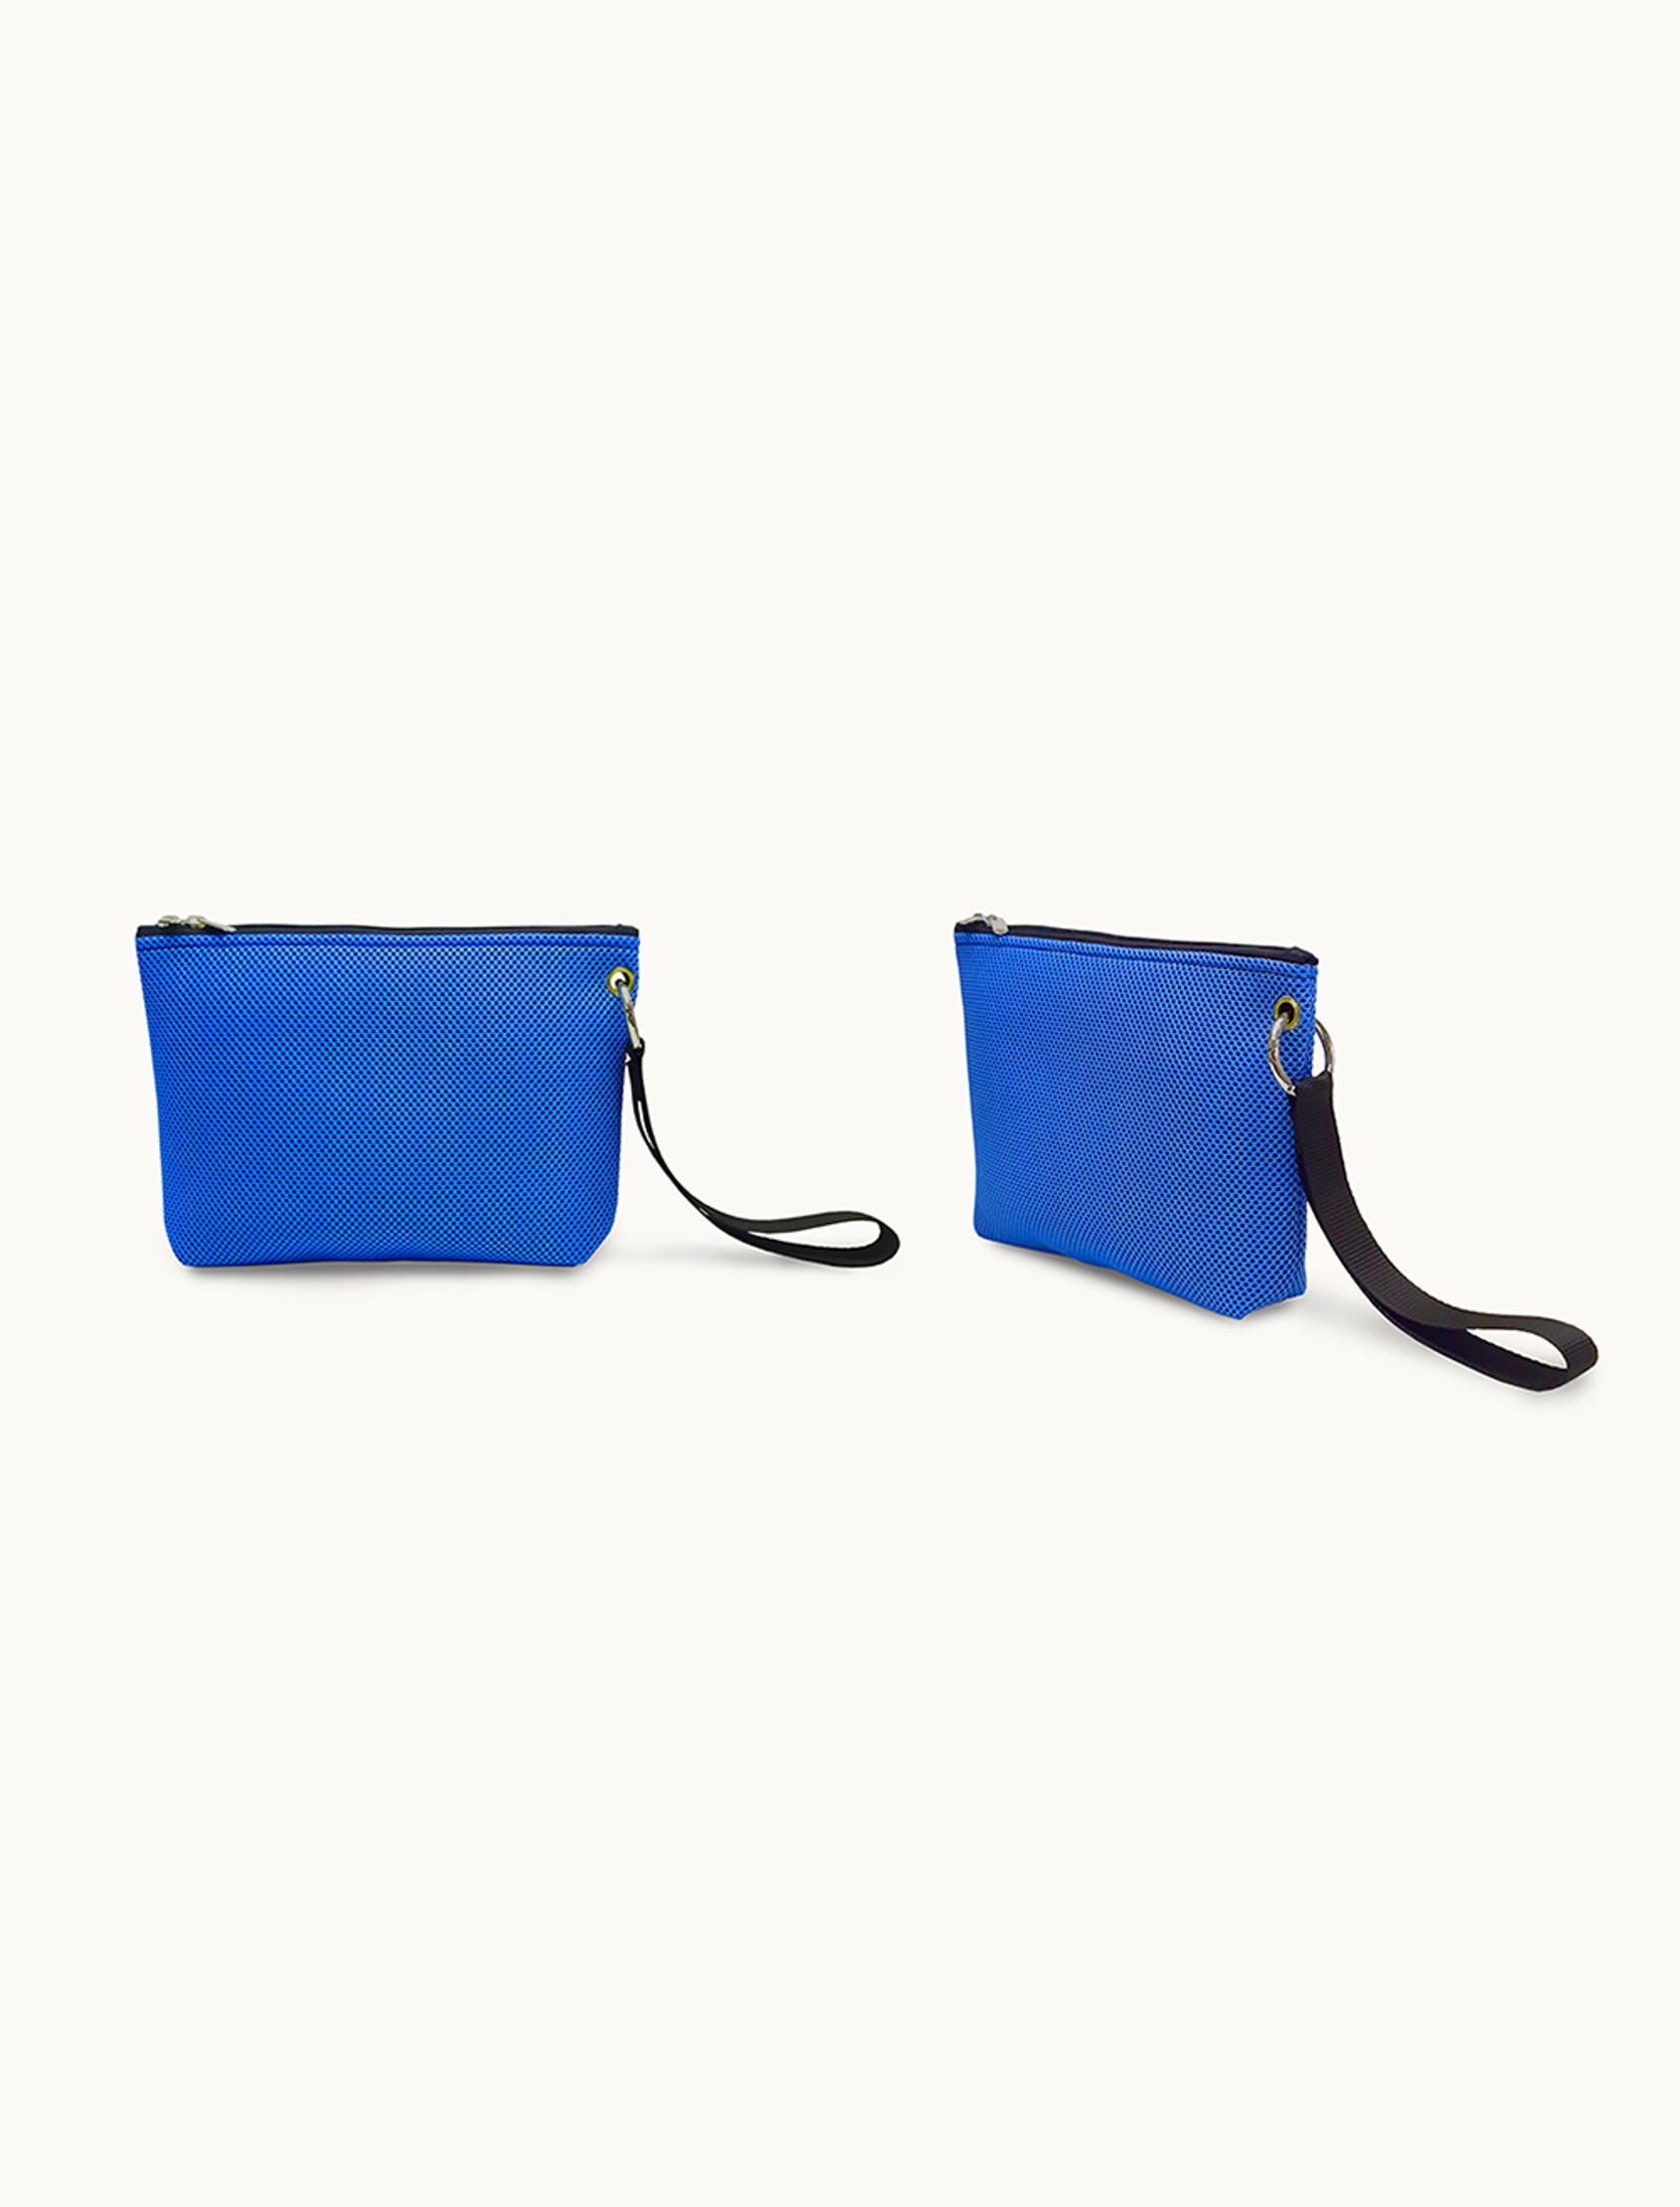 Bolso de mano unisex Sport Azul Klein de Peter&Wolf tejido técnico 3D. Ligero, resistente y lavable. Exterior color azul klein.